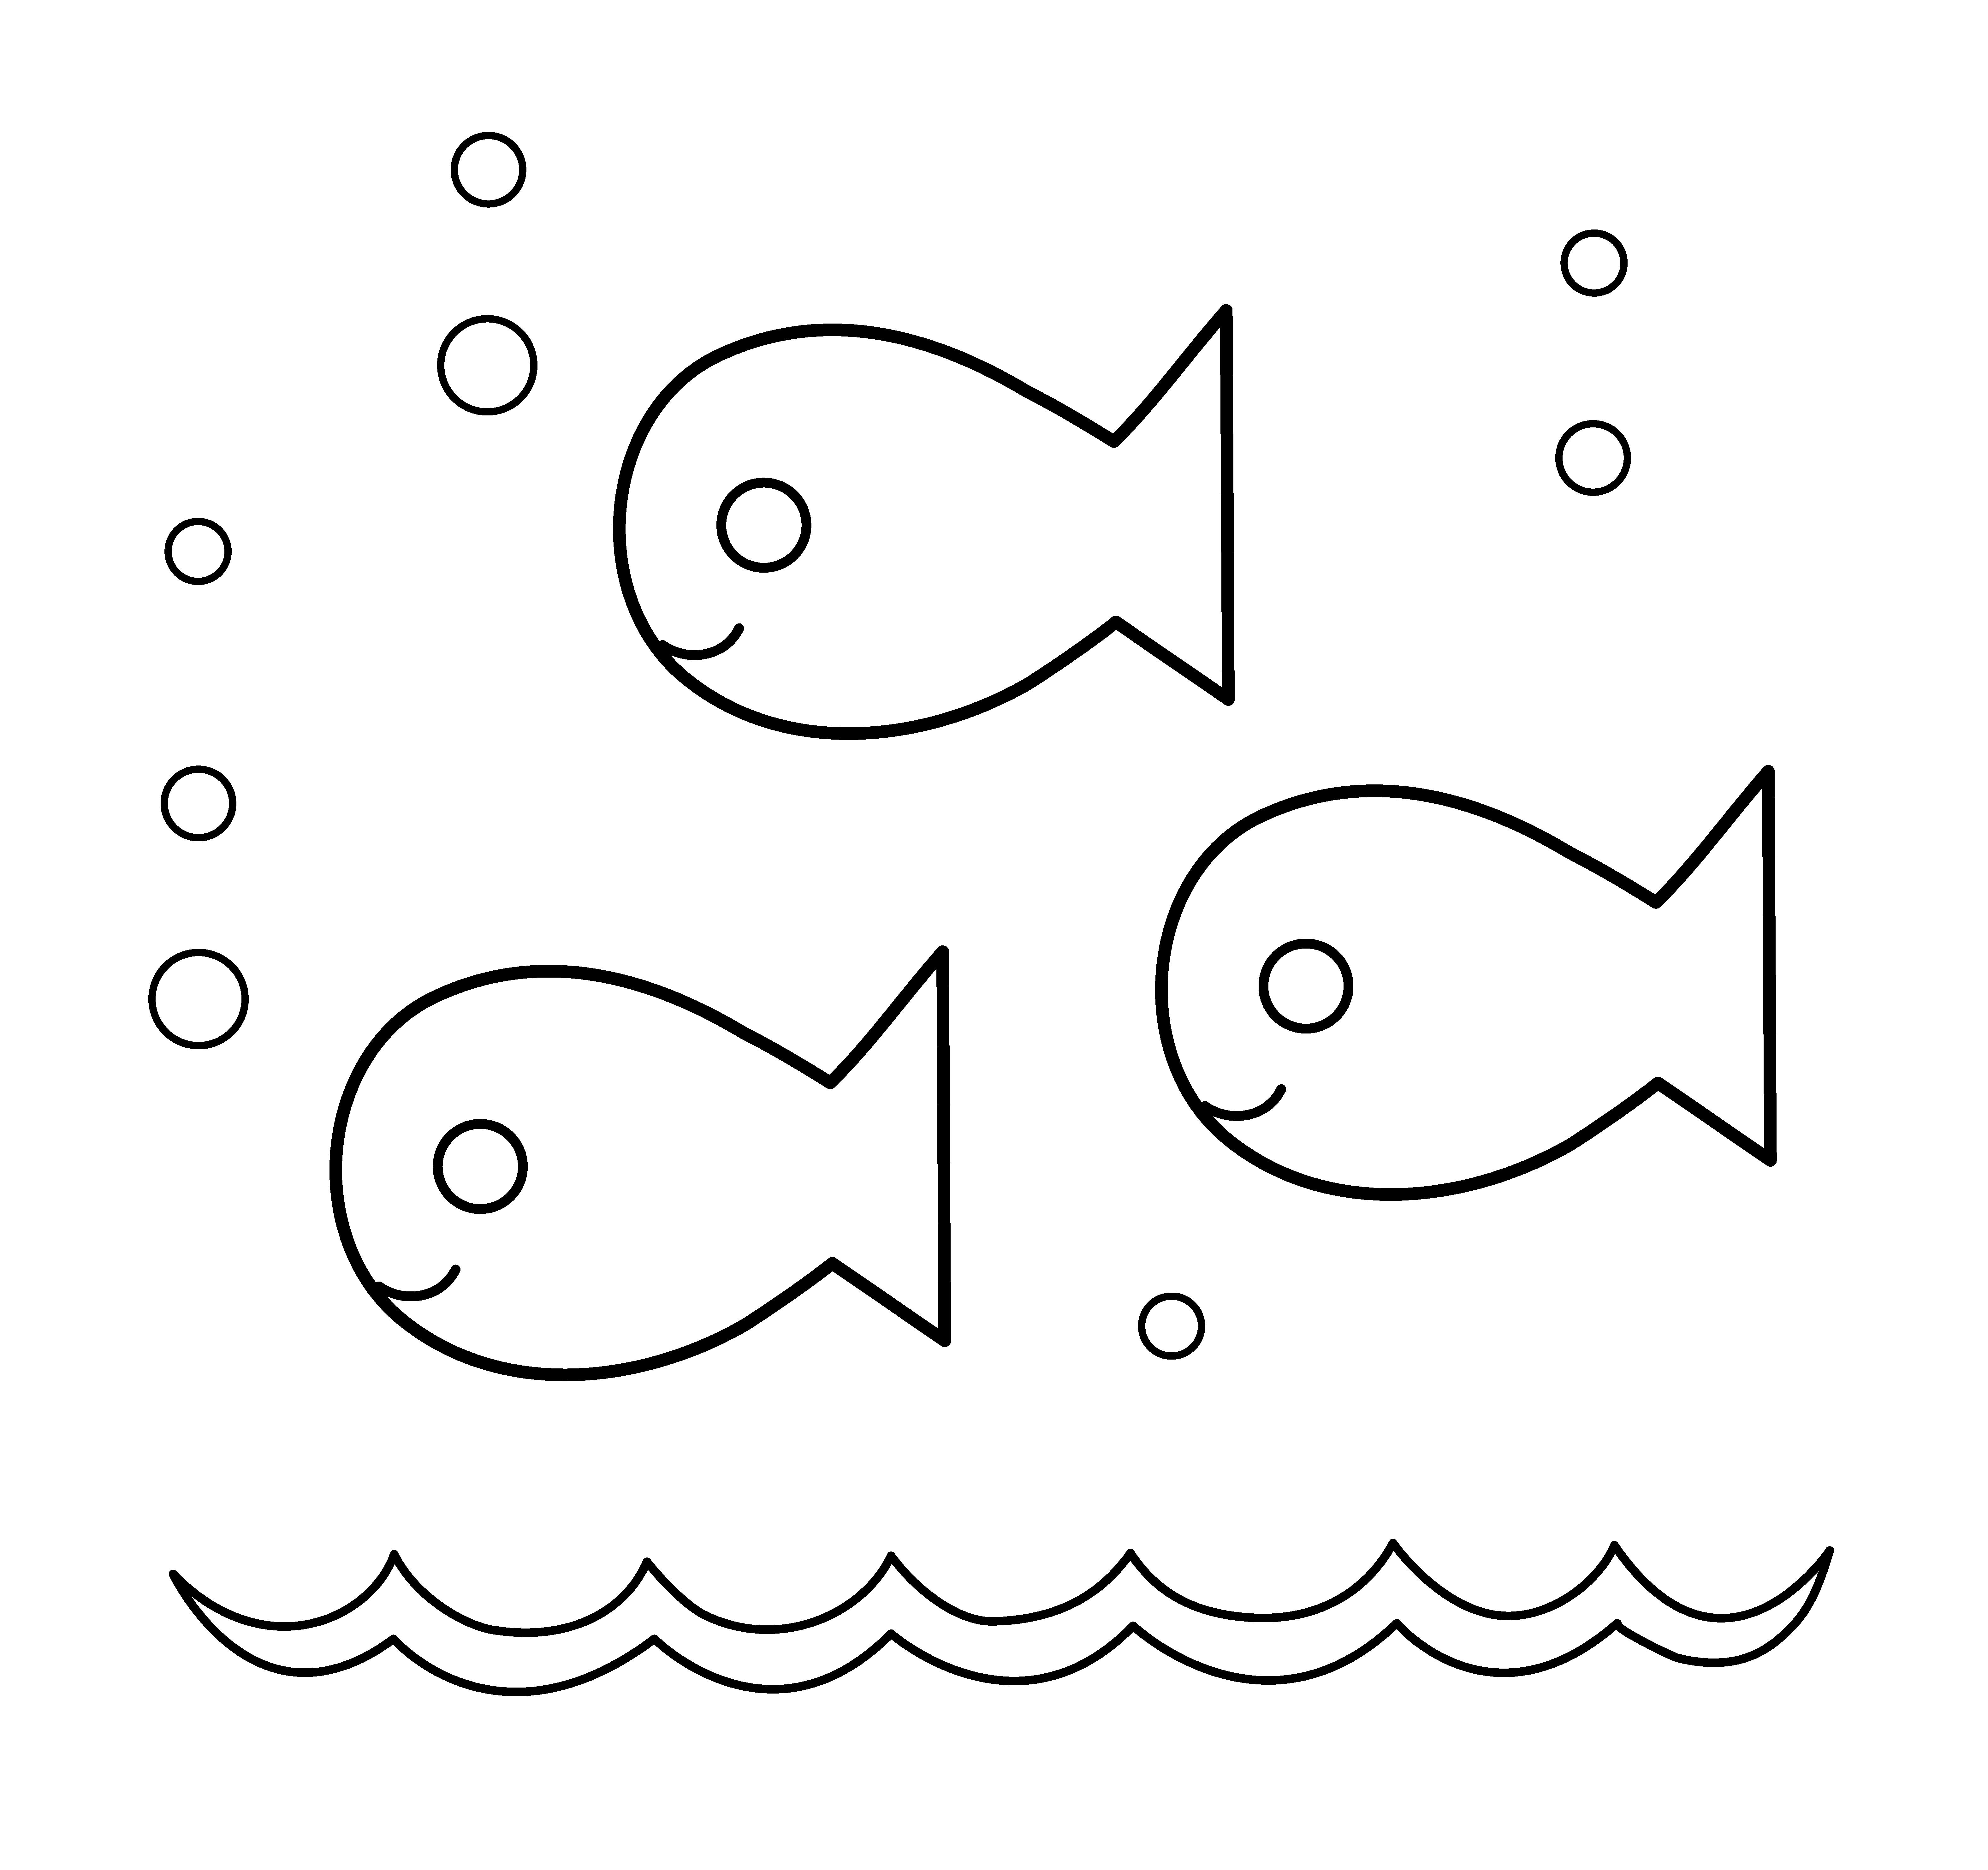 Free Clip Art Cute Fish .-Free Clip Art Cute Fish .-10